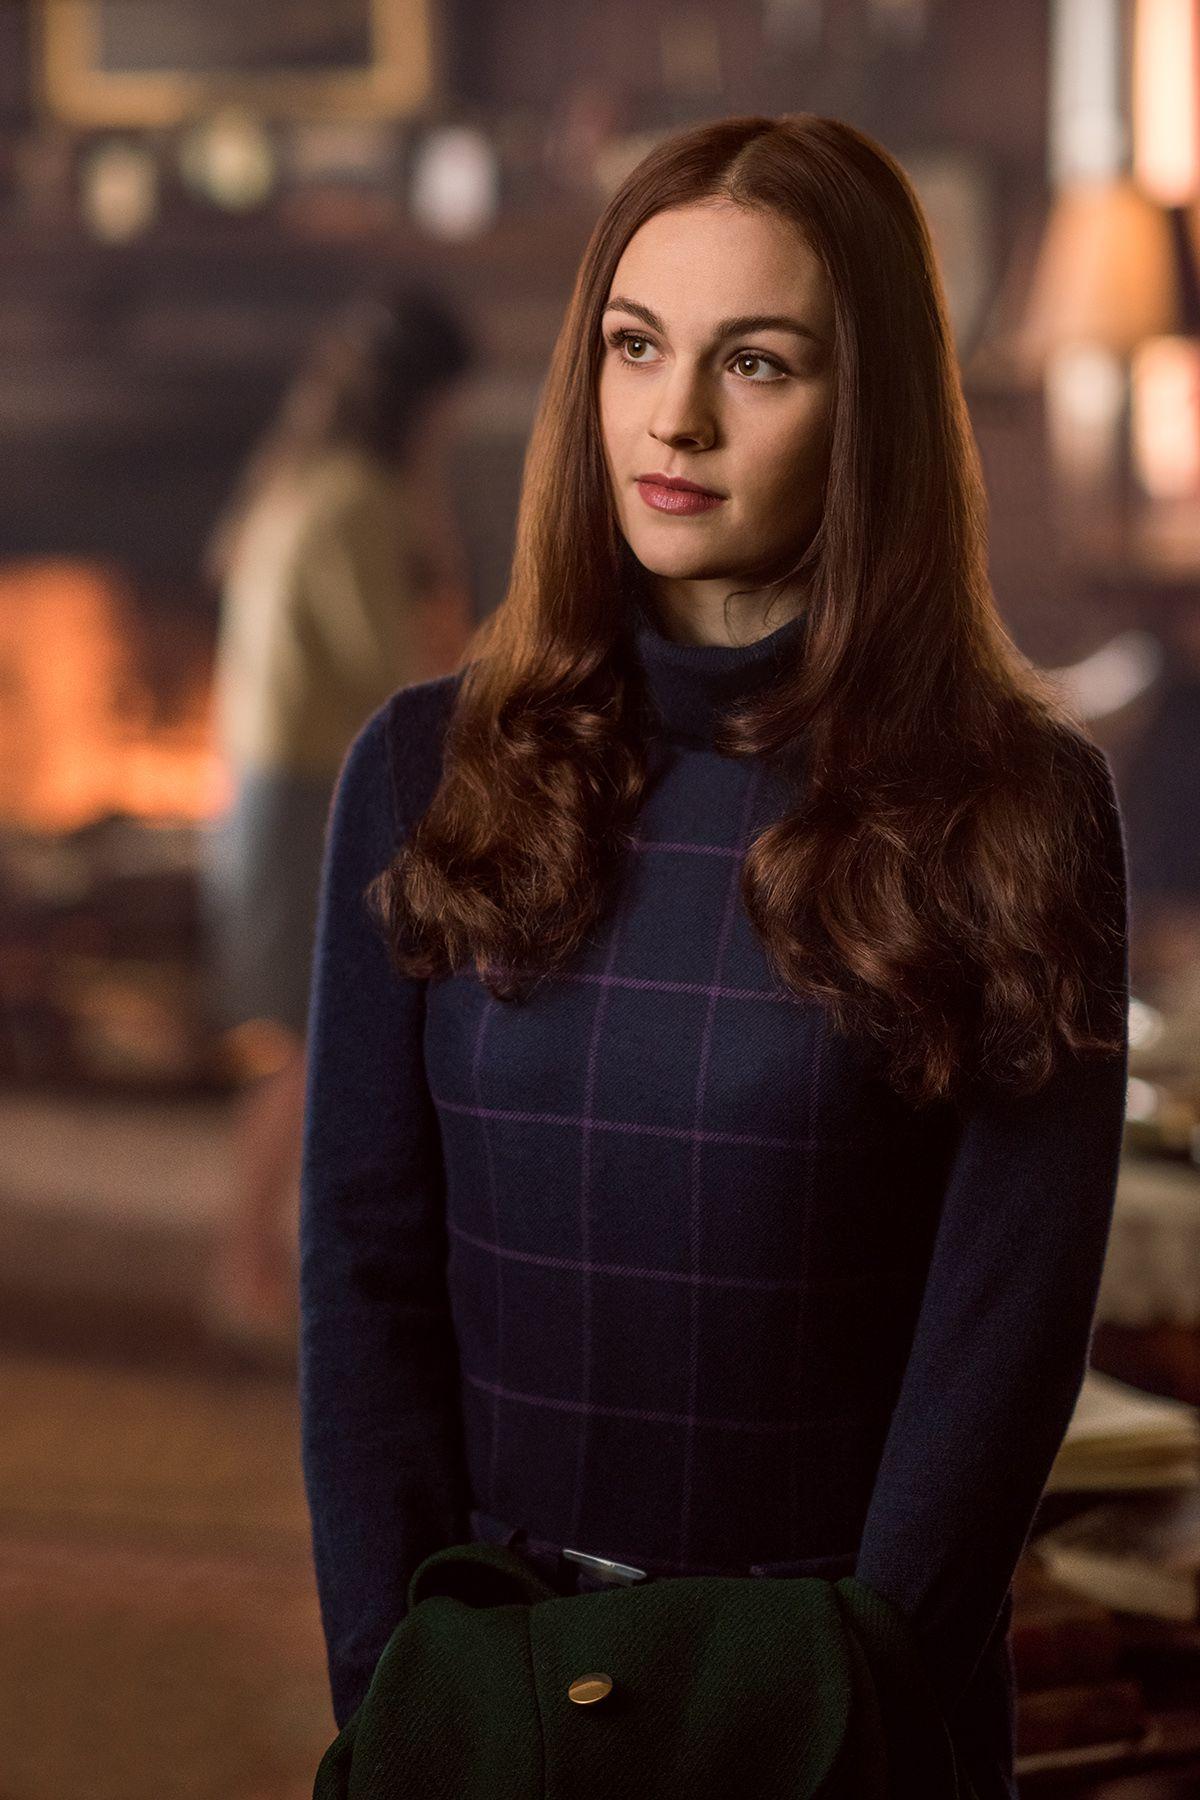 Outlander saison 4 rencontre brianna et jamie